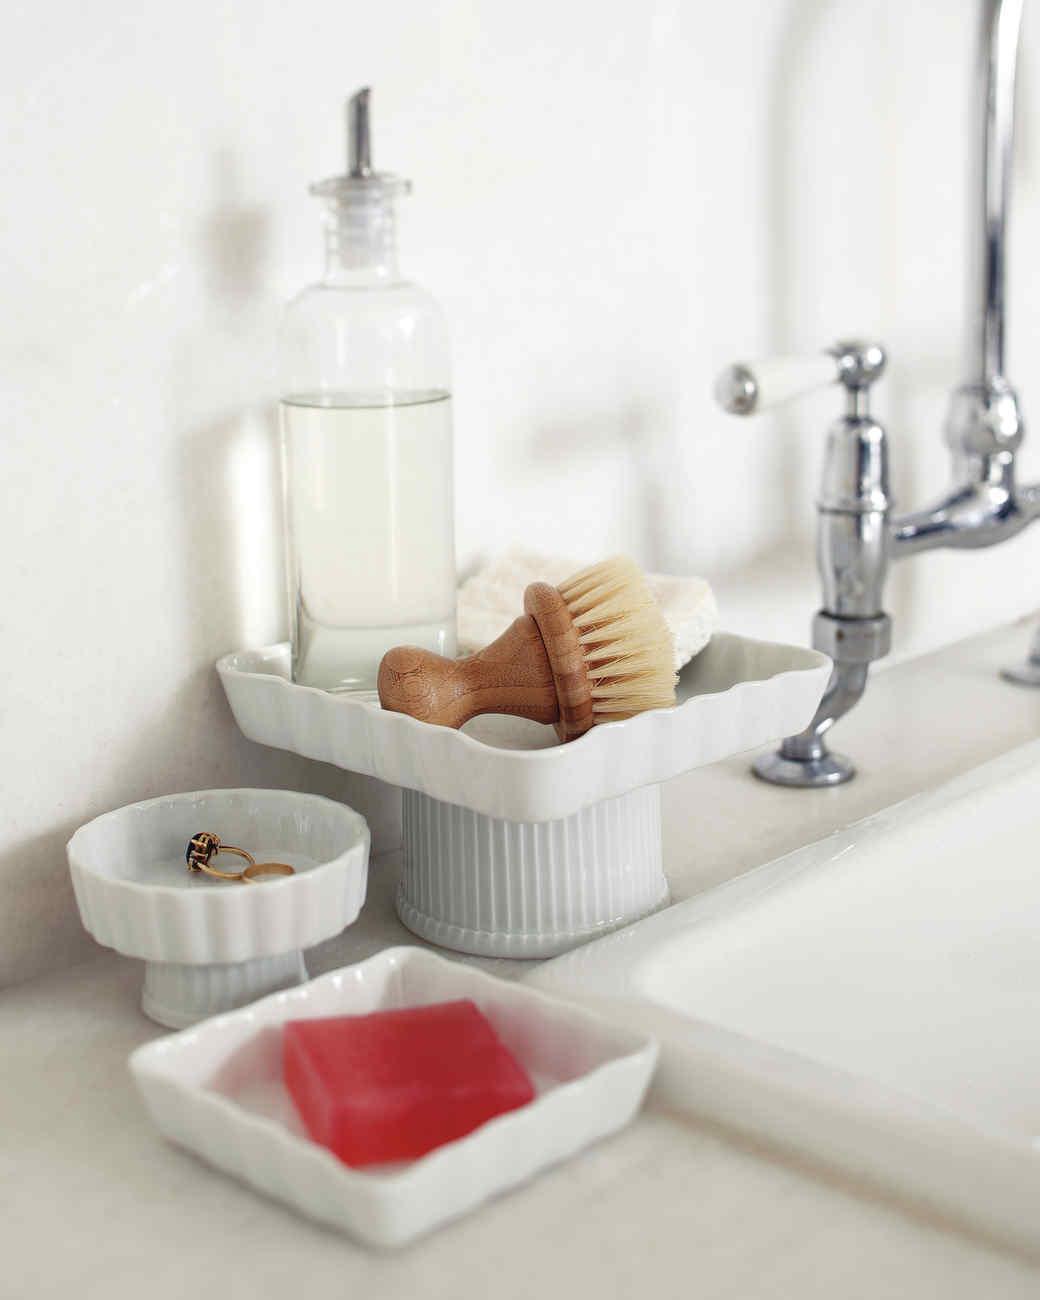 cakestands-sink-mld108936.jpg